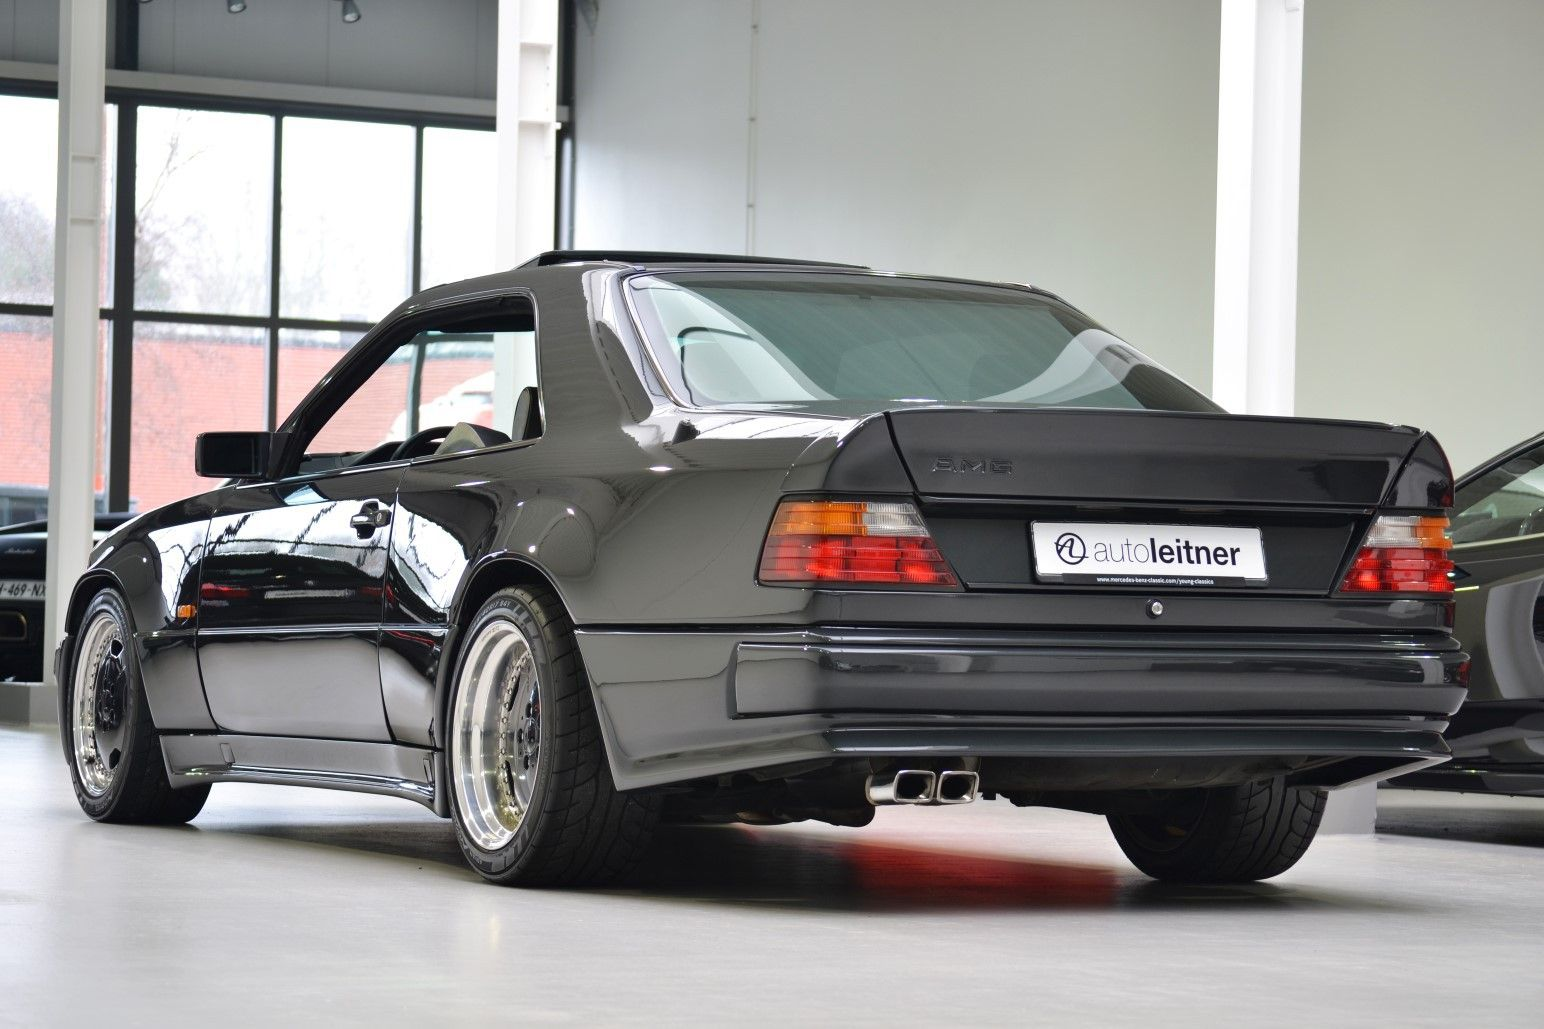 How many amg 6 0 4v w126 sec and sel cars were built amg side shot - 1987 Mercedes Amg Hammer Cars I Love Pinterest Mercedes Amg And Cars